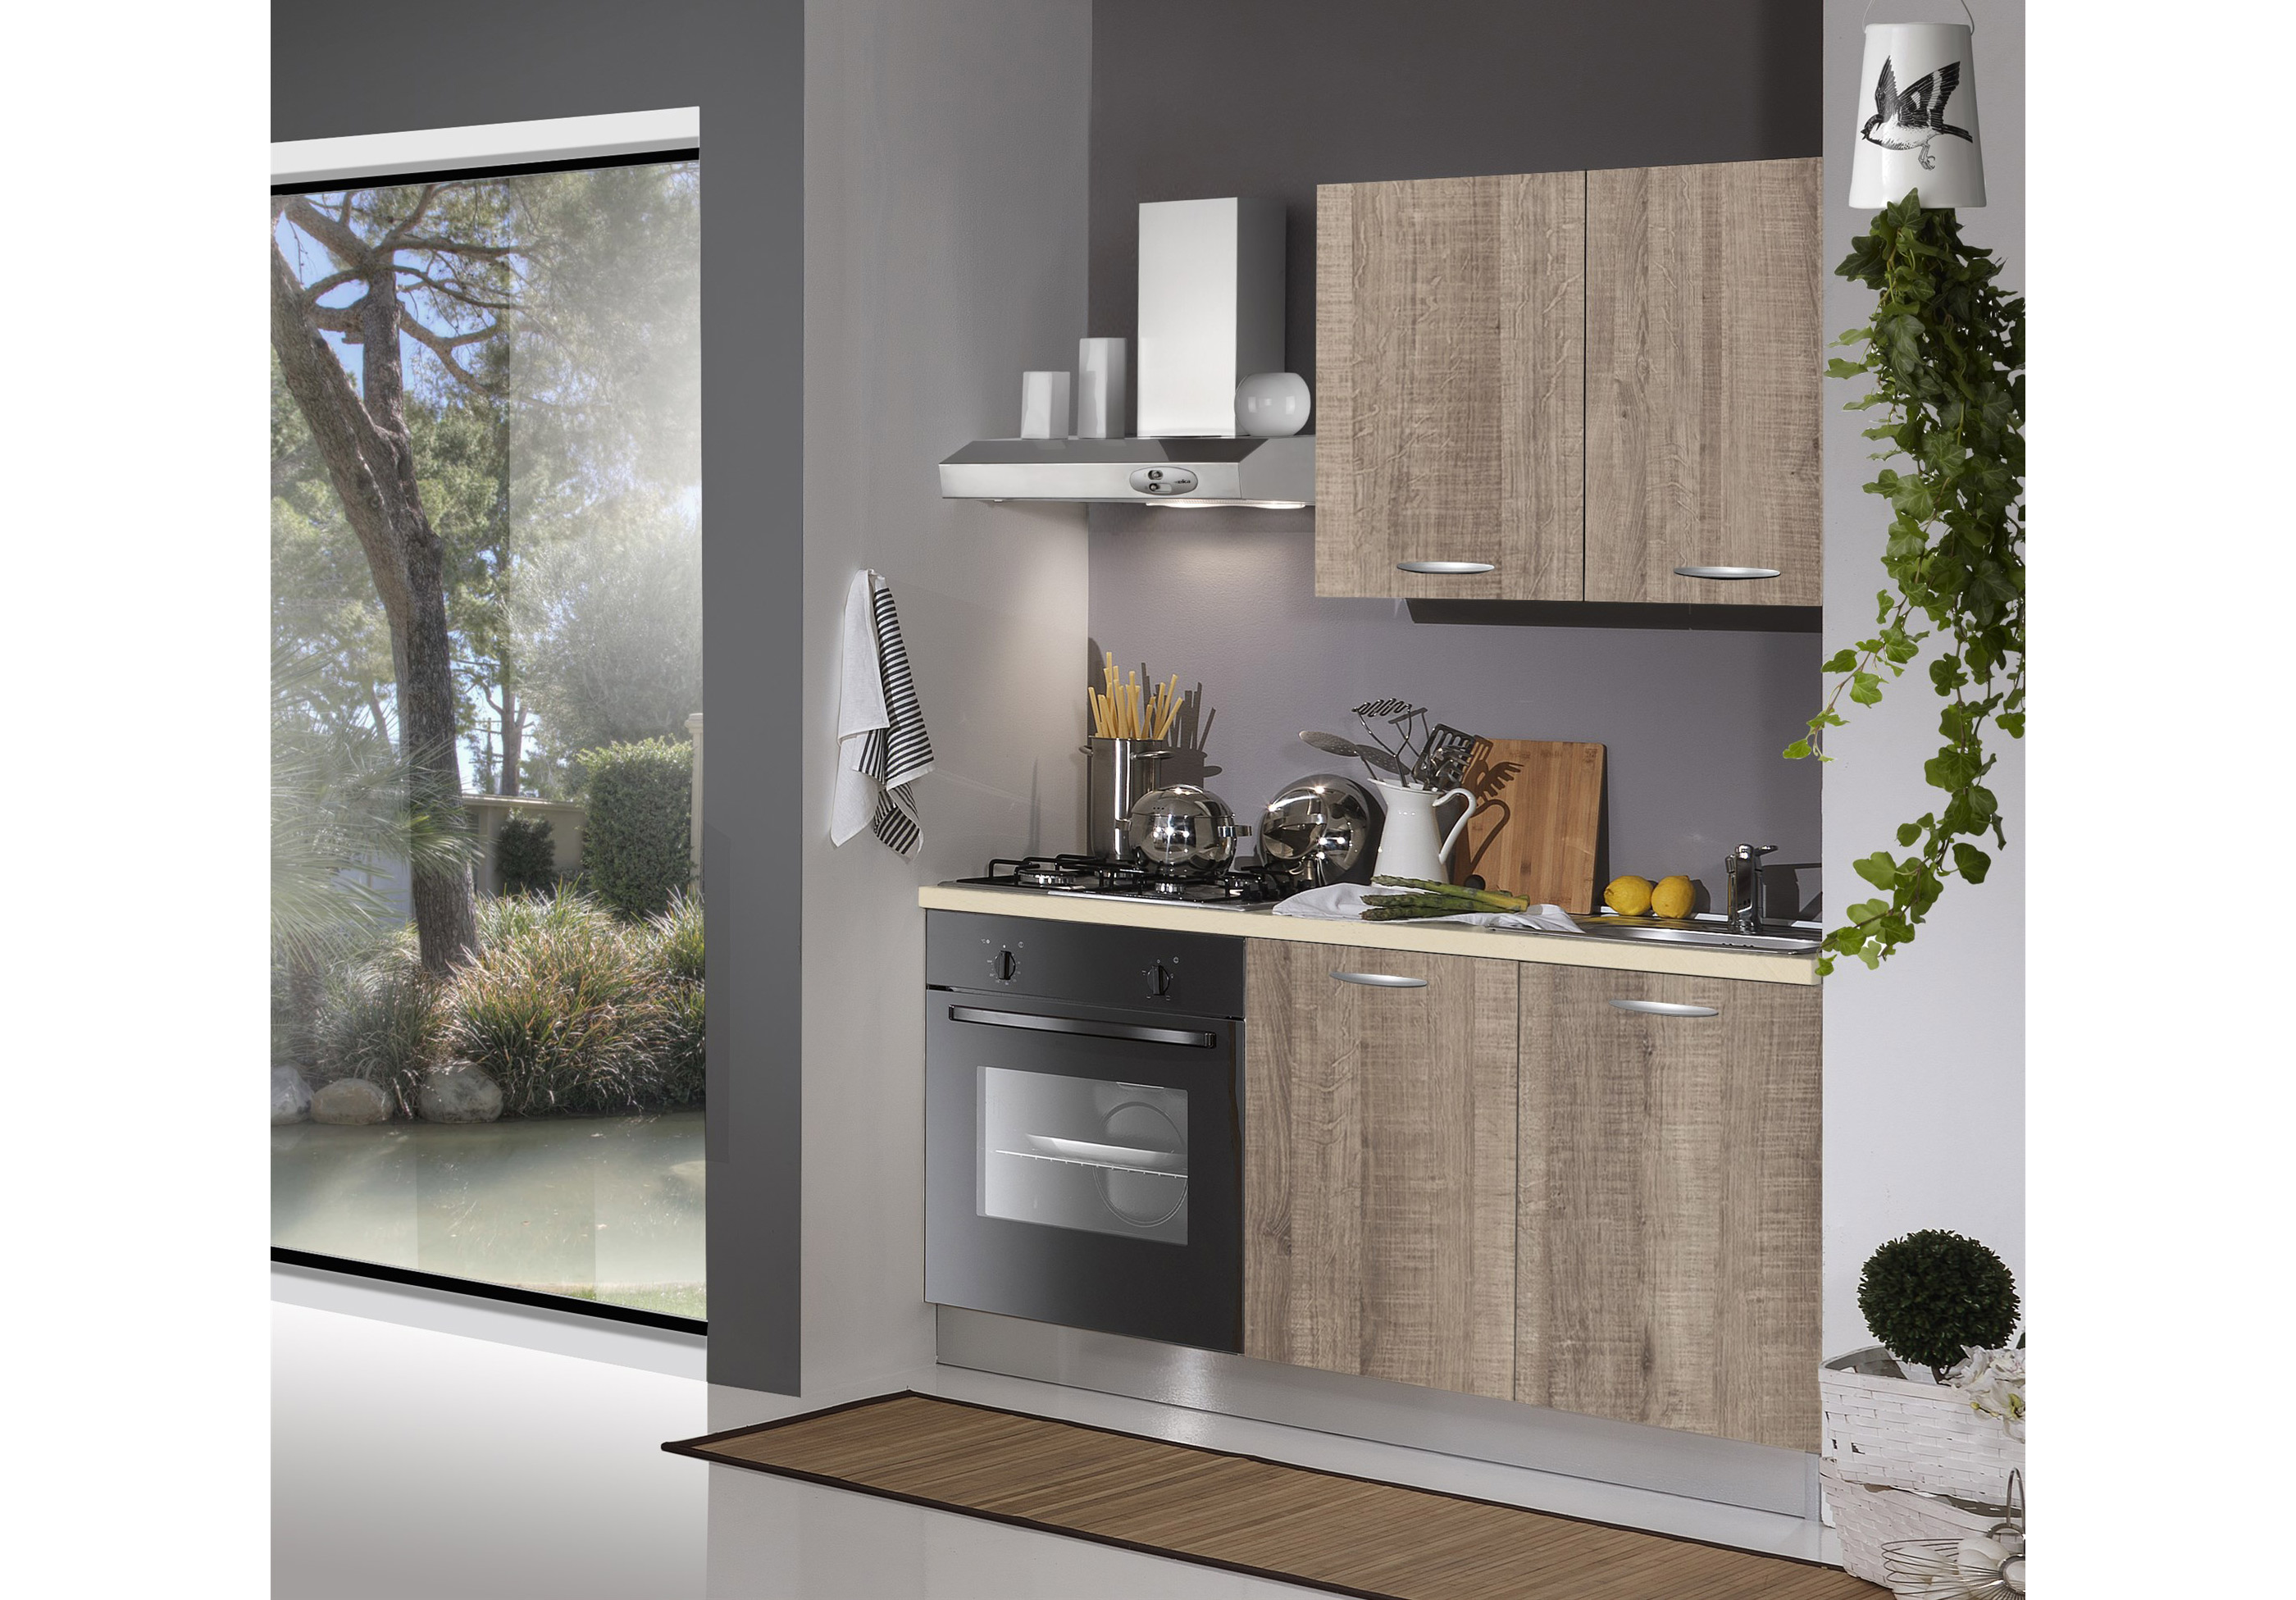 Cucina monoblok 150 cm arredamenti di lorenzo napoli for Arredamenti moderni cucine